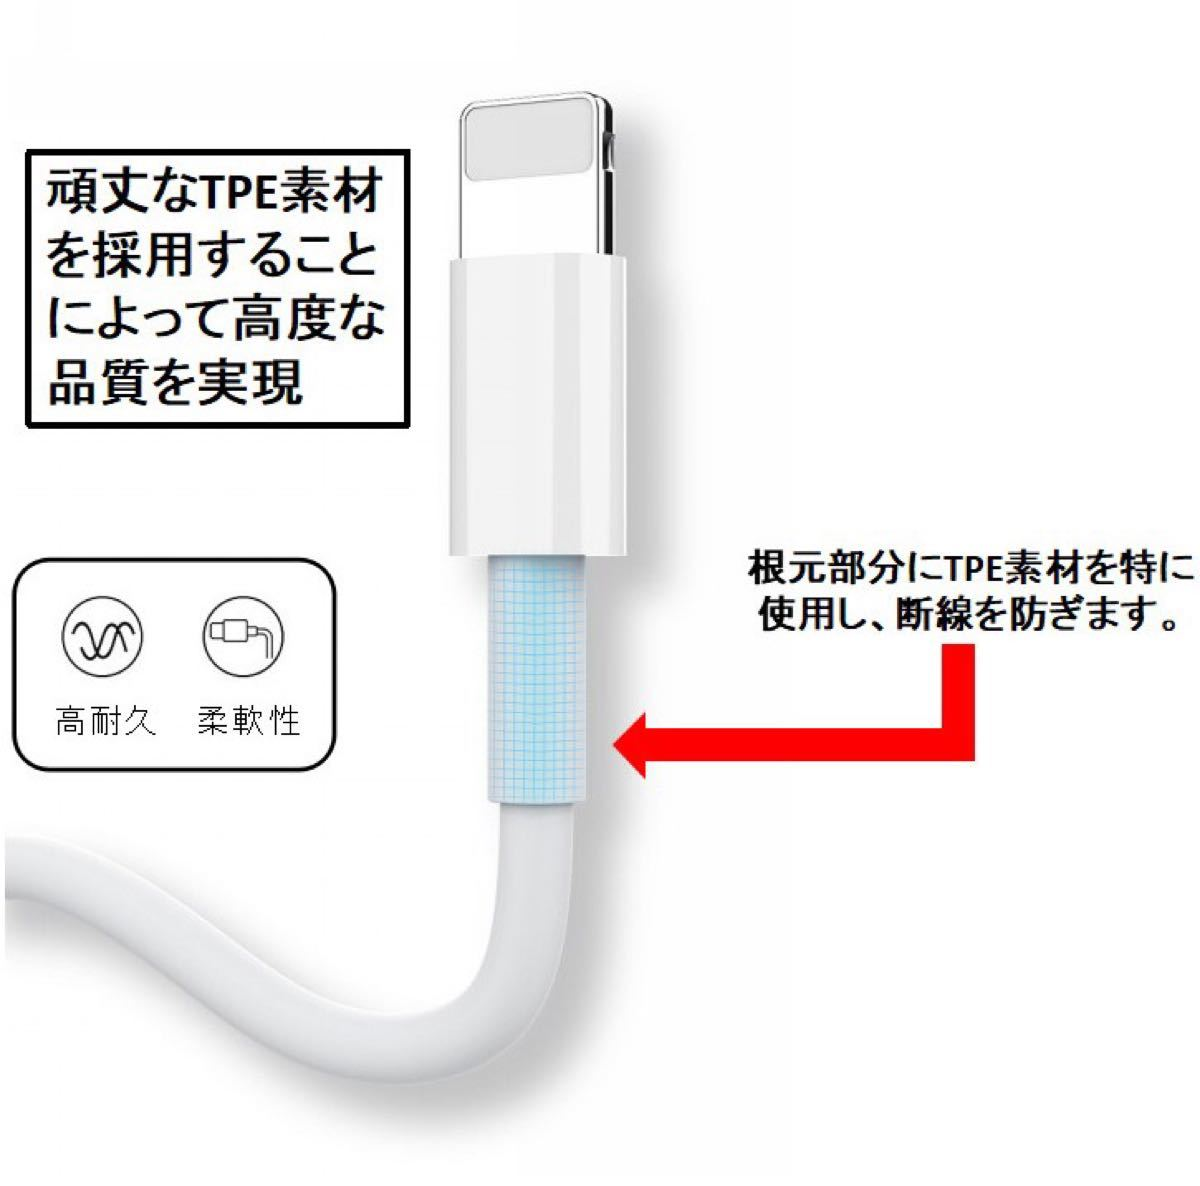 iPhone ライトニングケーブル 充電 1m 5本セット+1本 送料無料 USBケーブル 急速充電 保証 安い データ通信